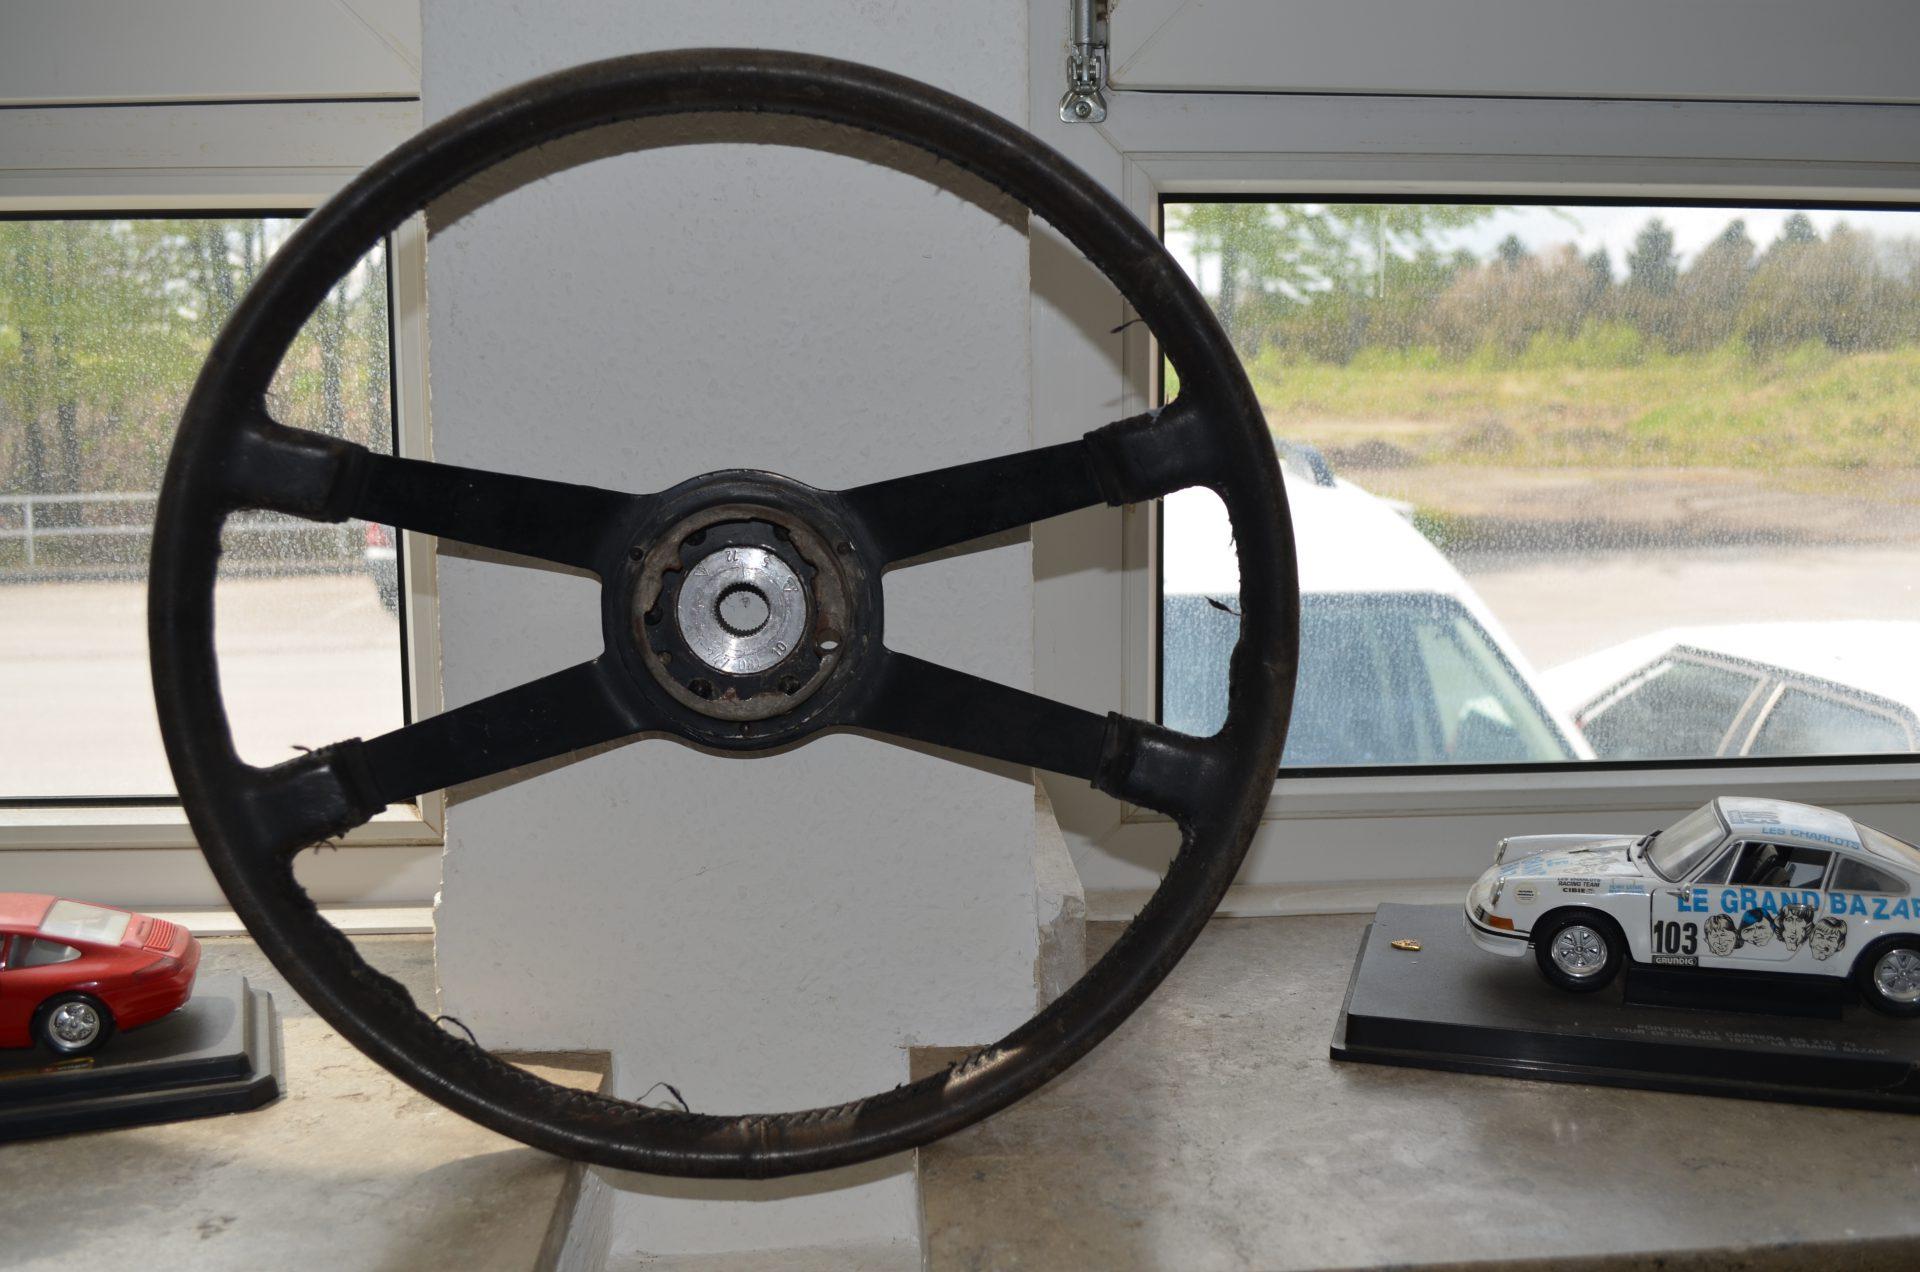 Lenkrad 40cm Durchmesser (authentischer Lederbezug) Image